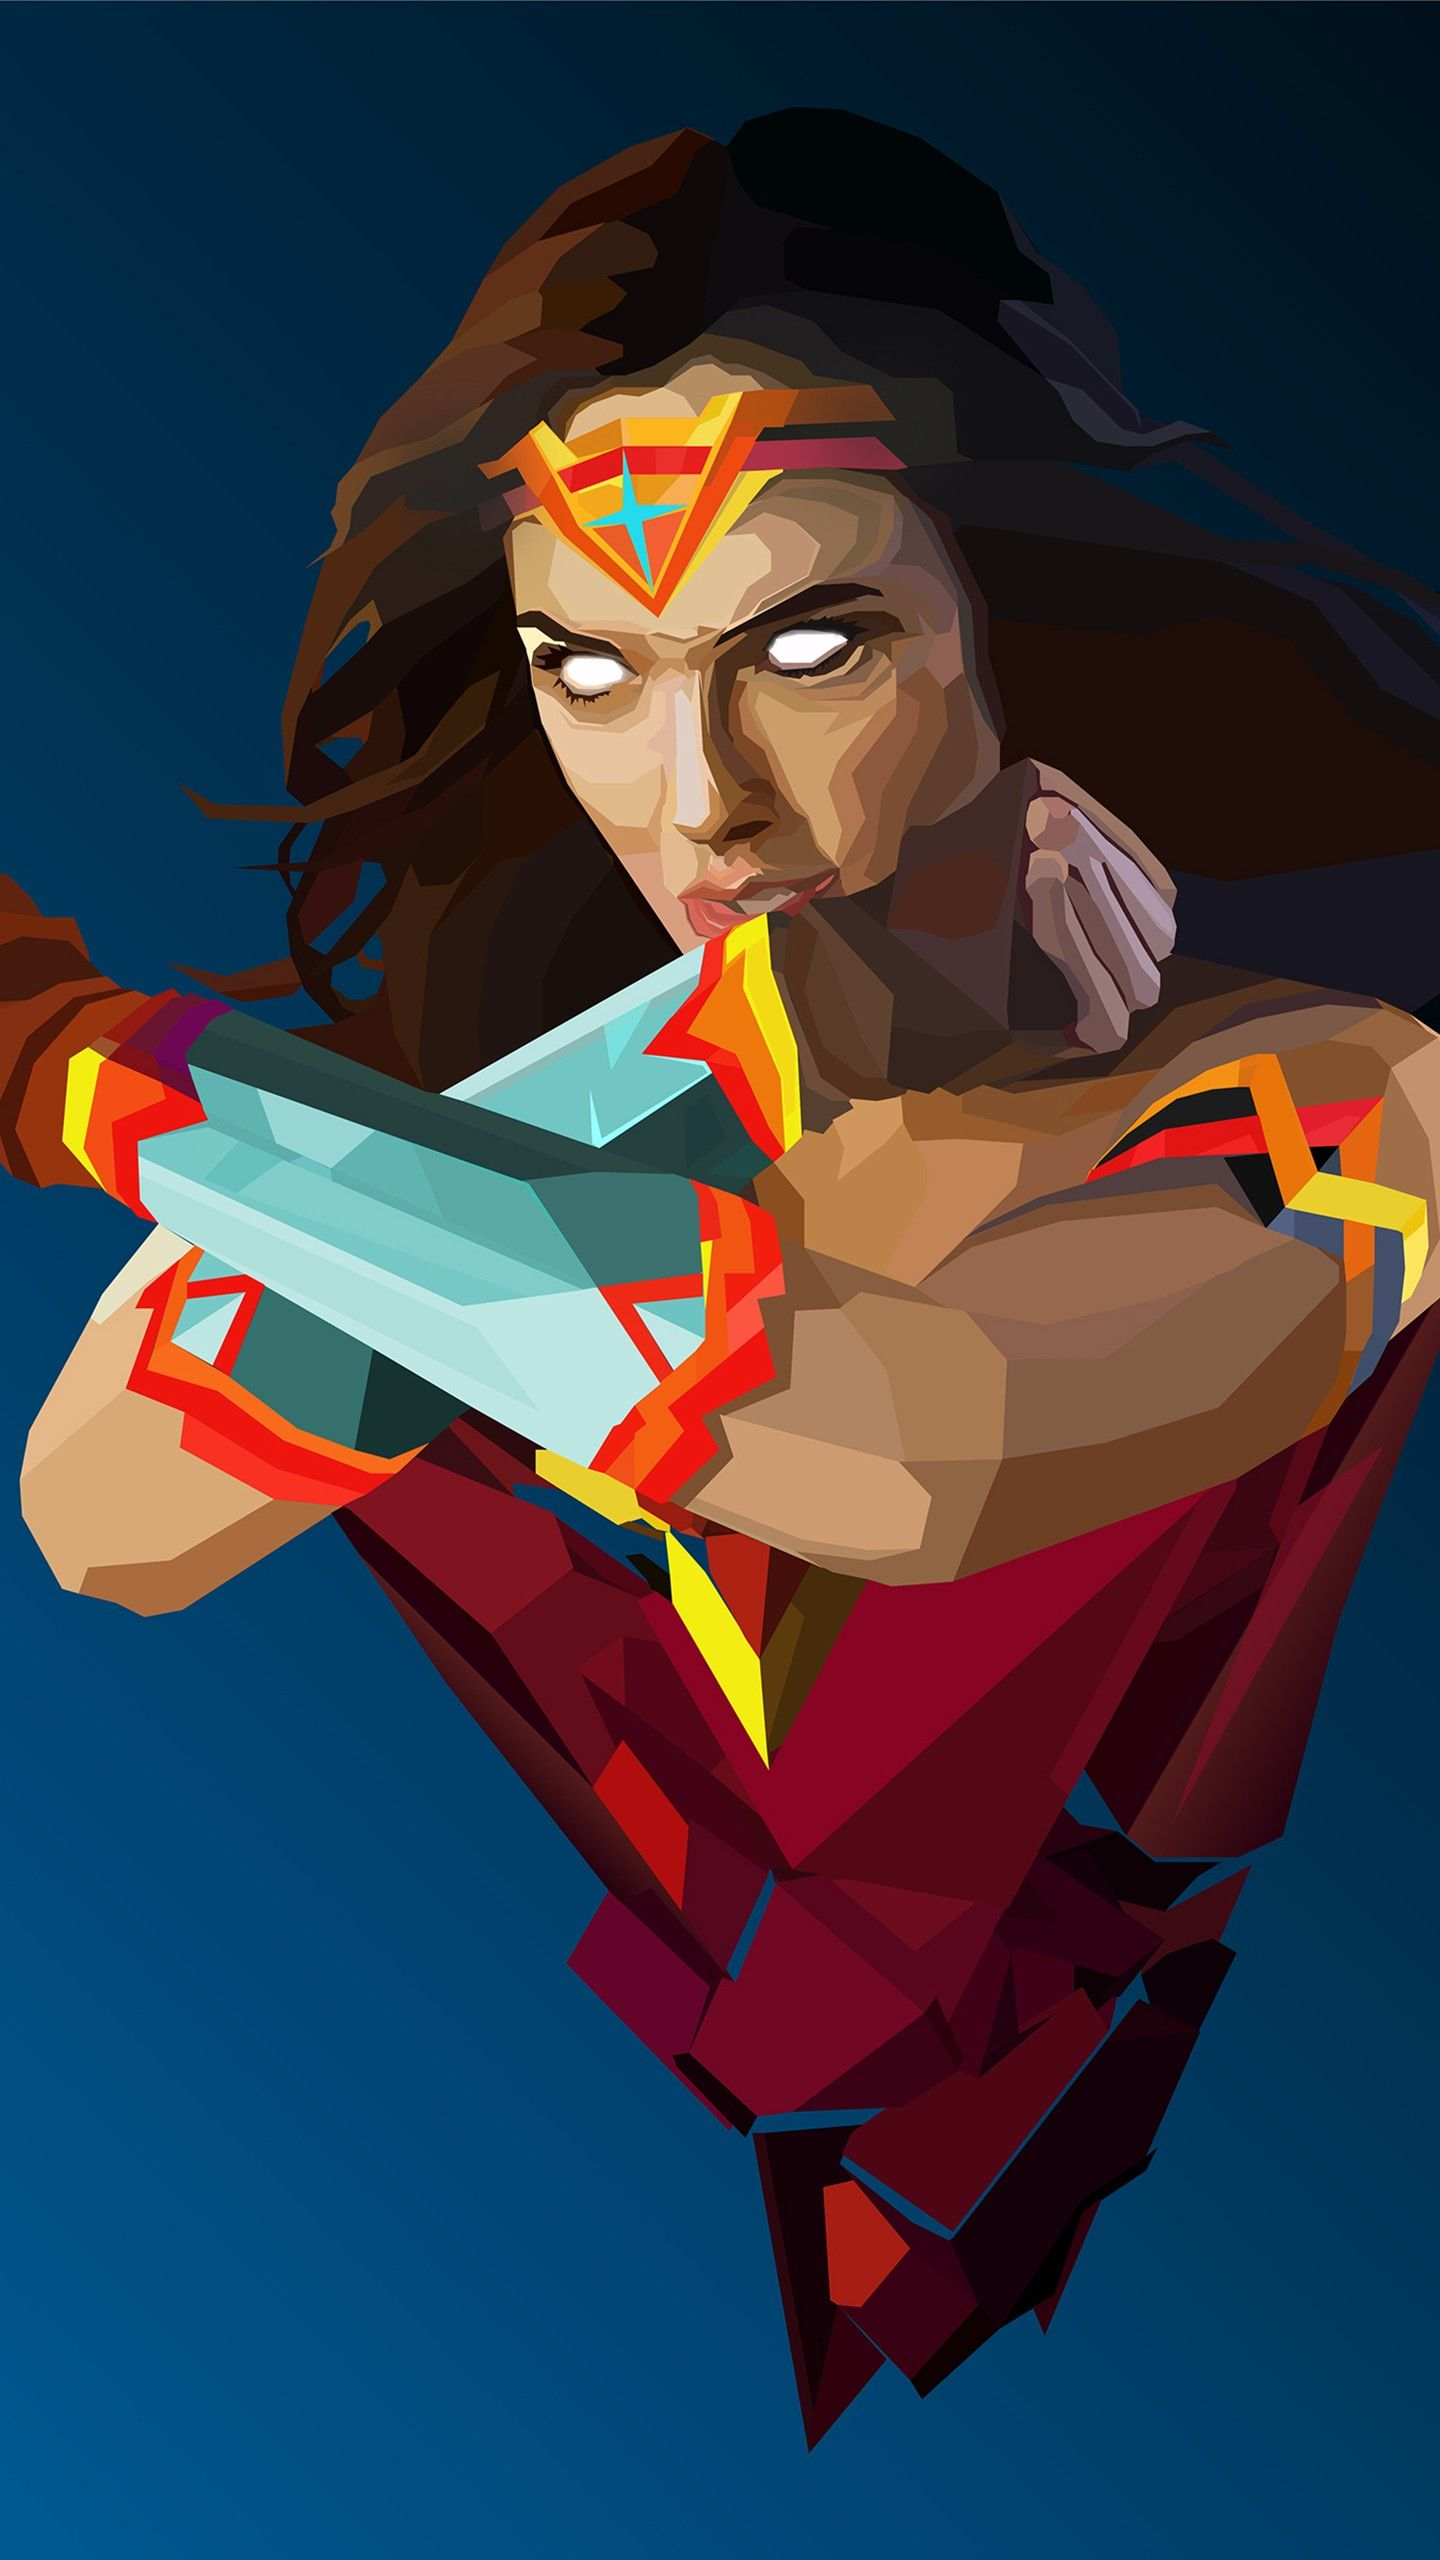 Misc Wonder Woman Artwork 4k Wallpapers Wonder Woman Artwork Qhd Wallpaper 1080p Wallpaper